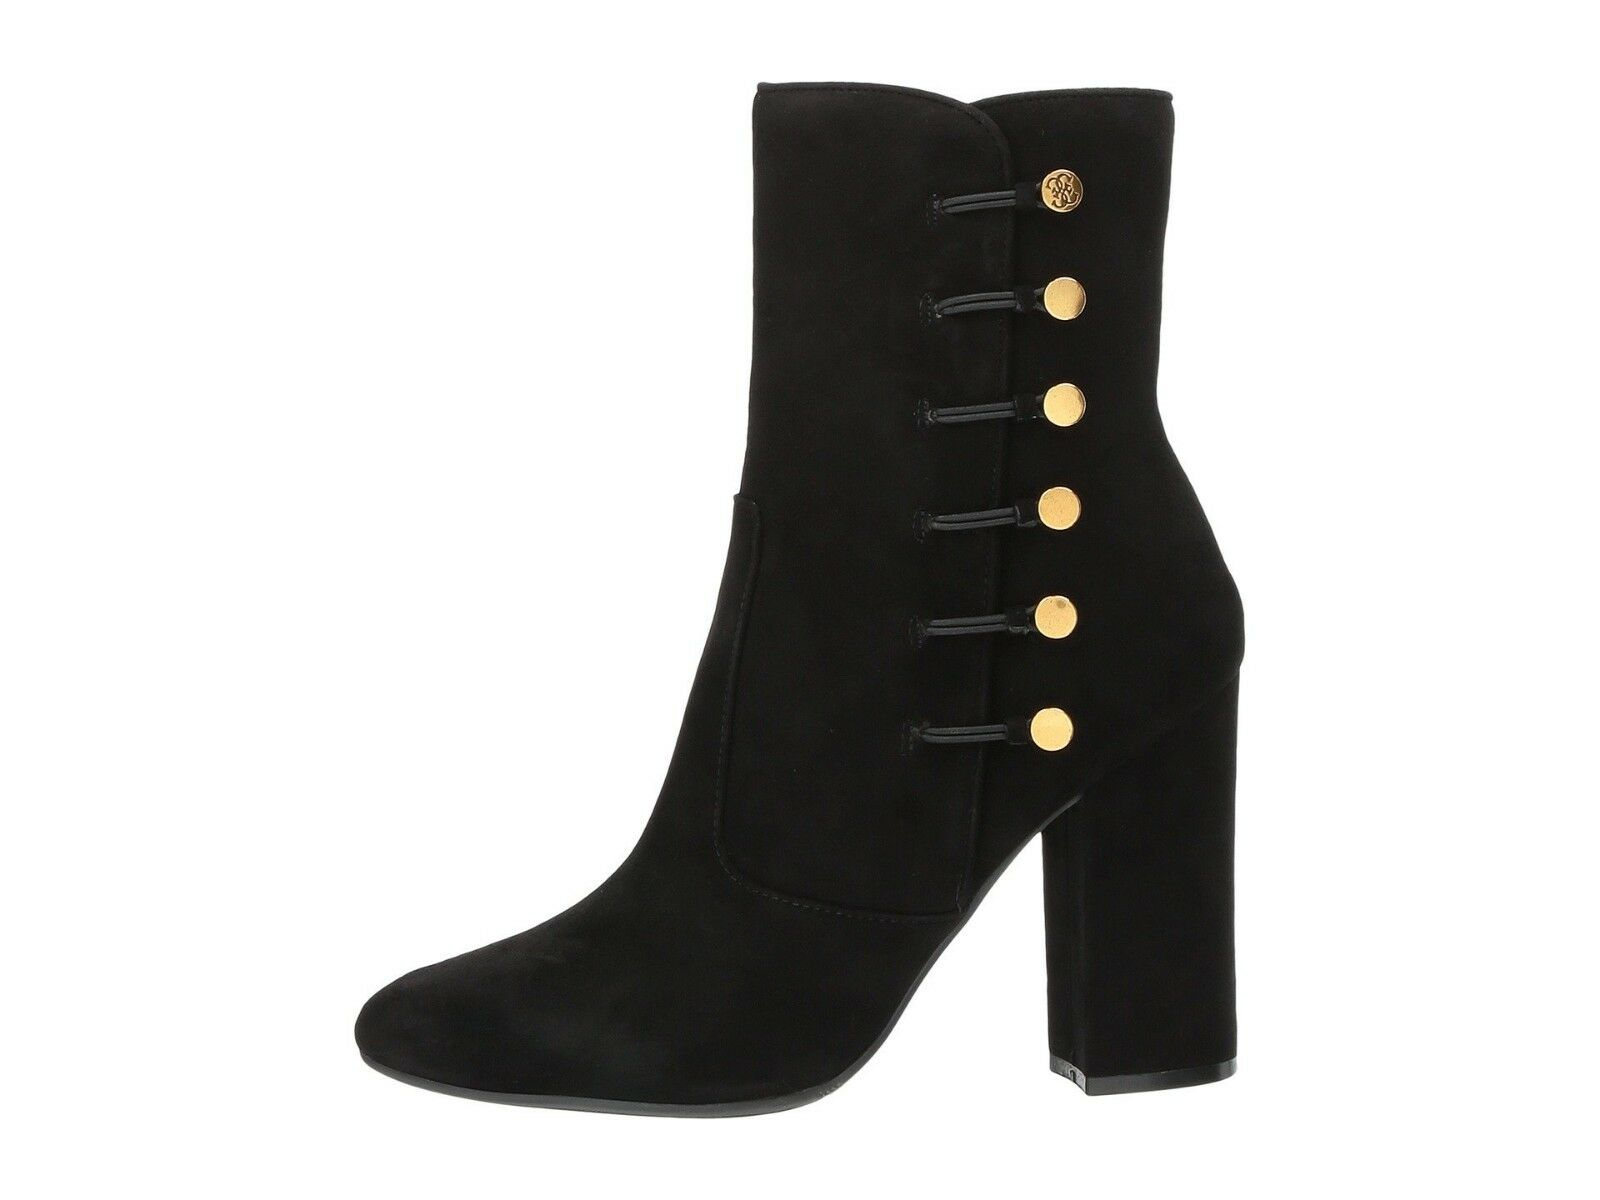 NEU GUESS Lucena  suede ankle Damens's boots Größe 8